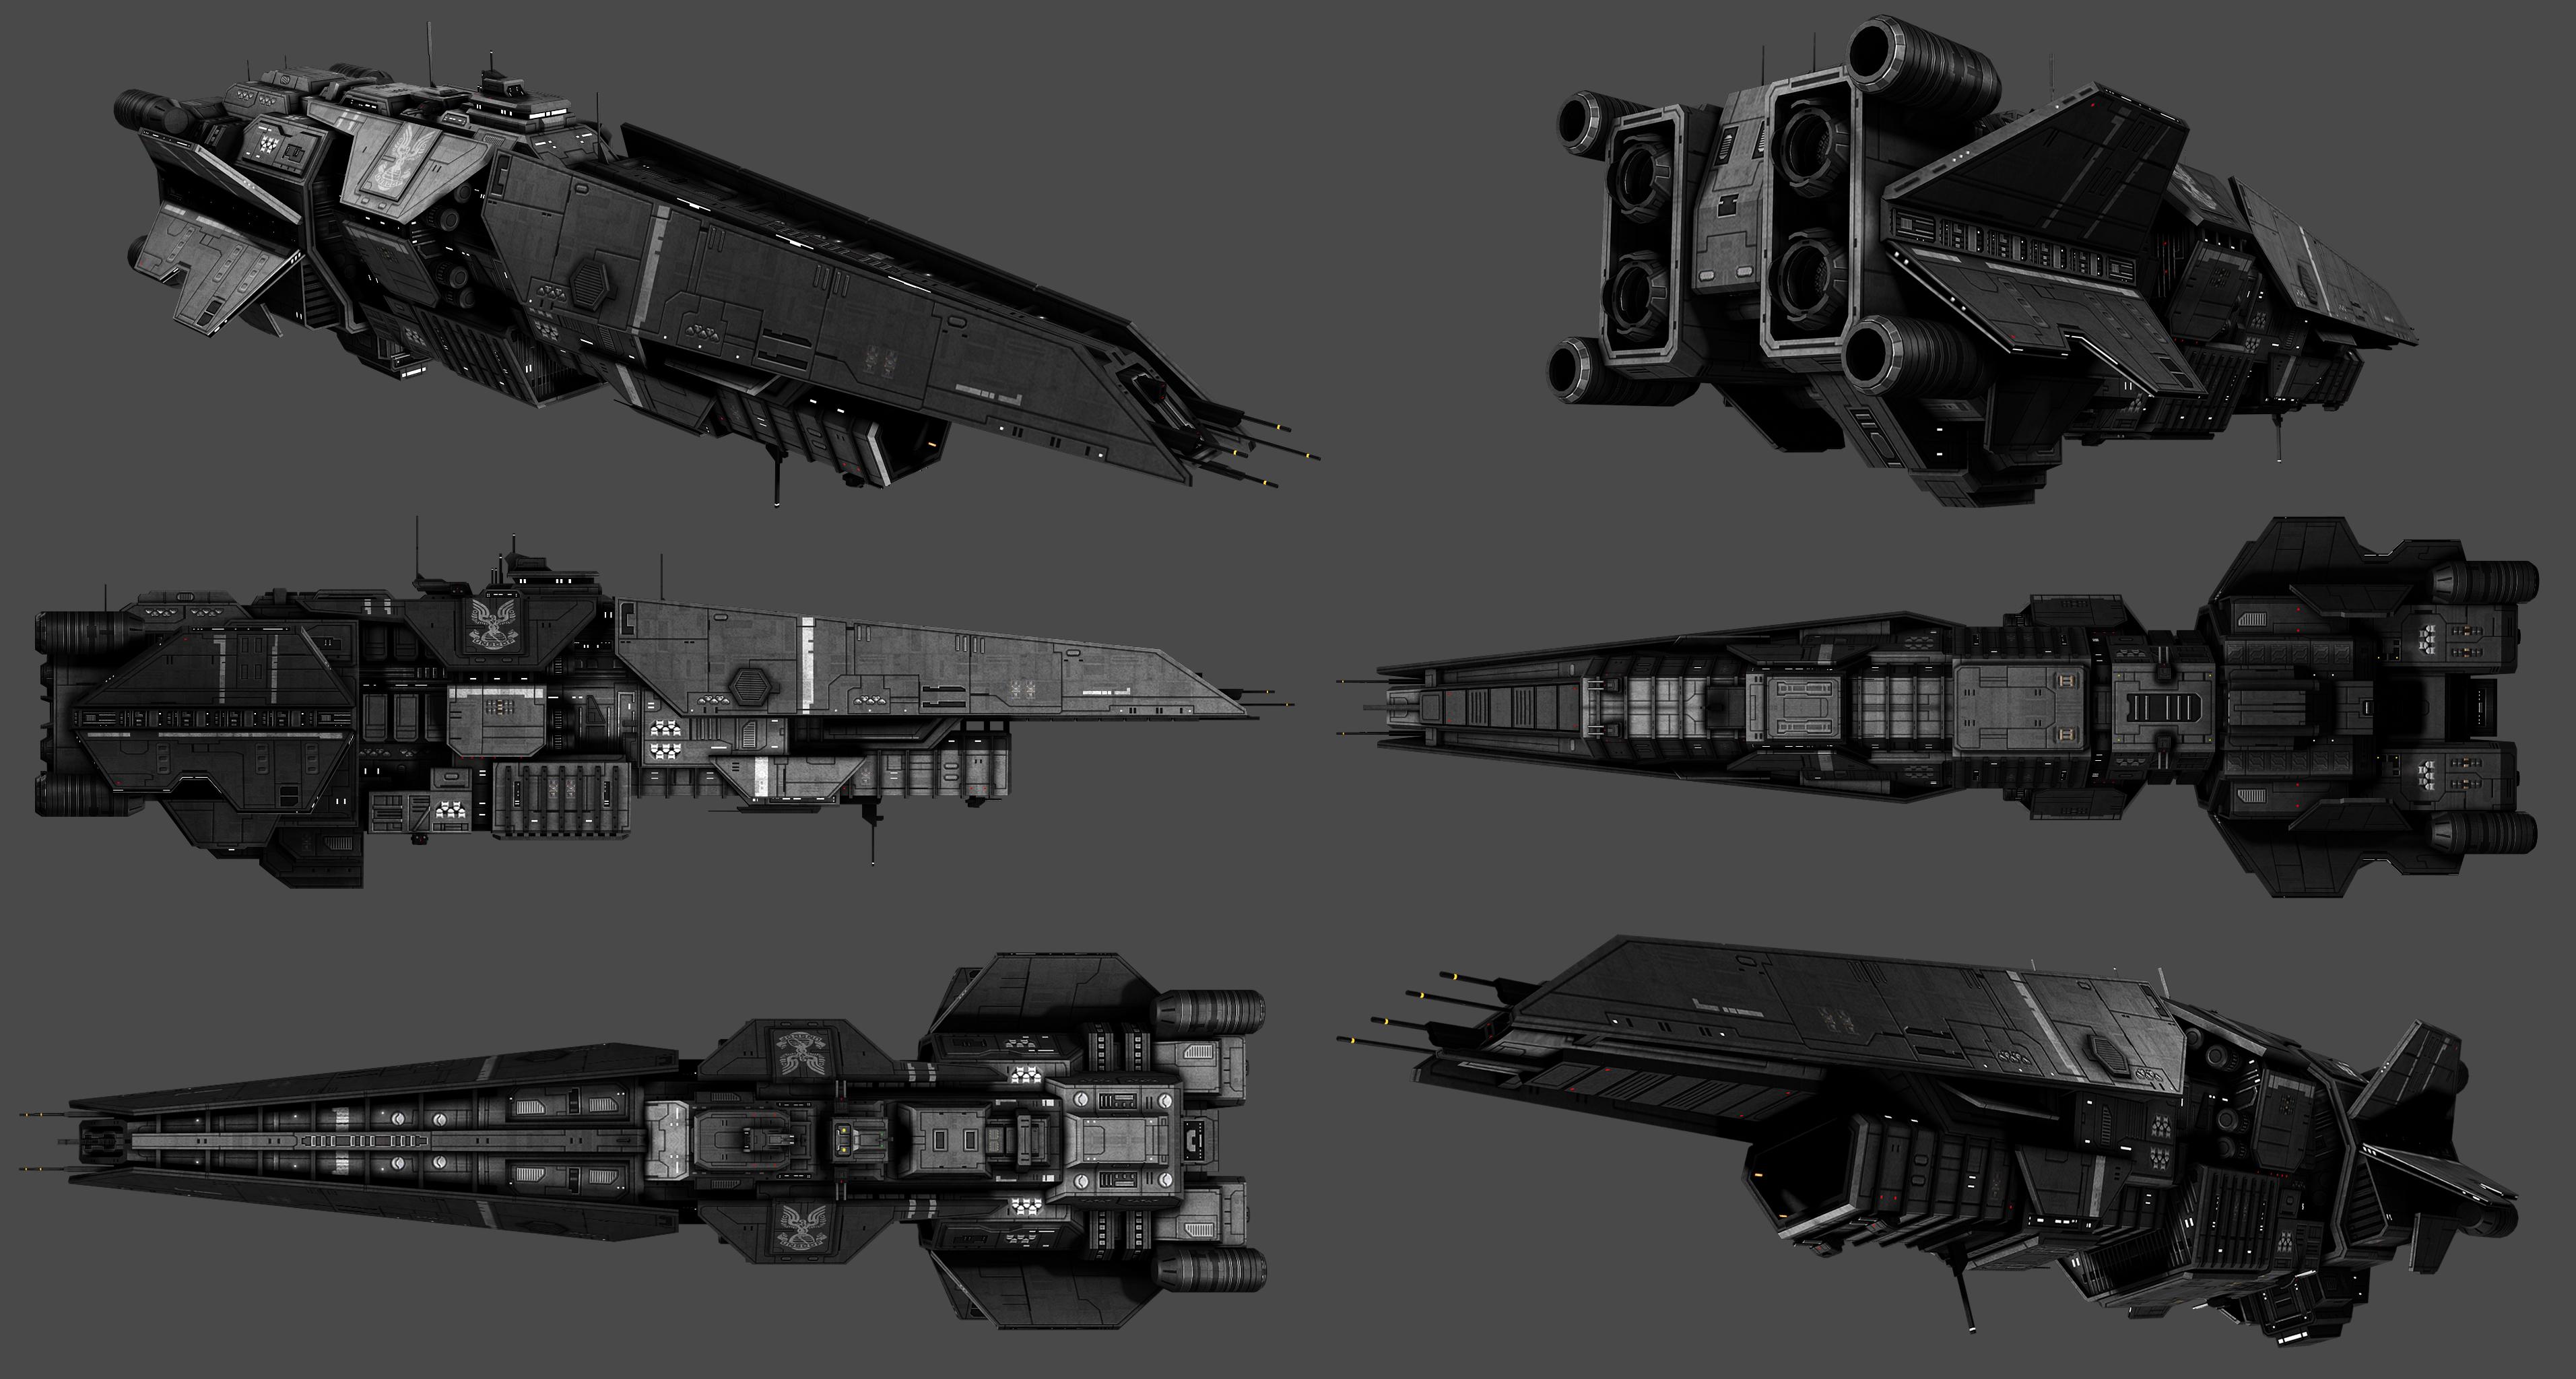 Halberd Class Destroyer Image Sins Of The Prophets Mod